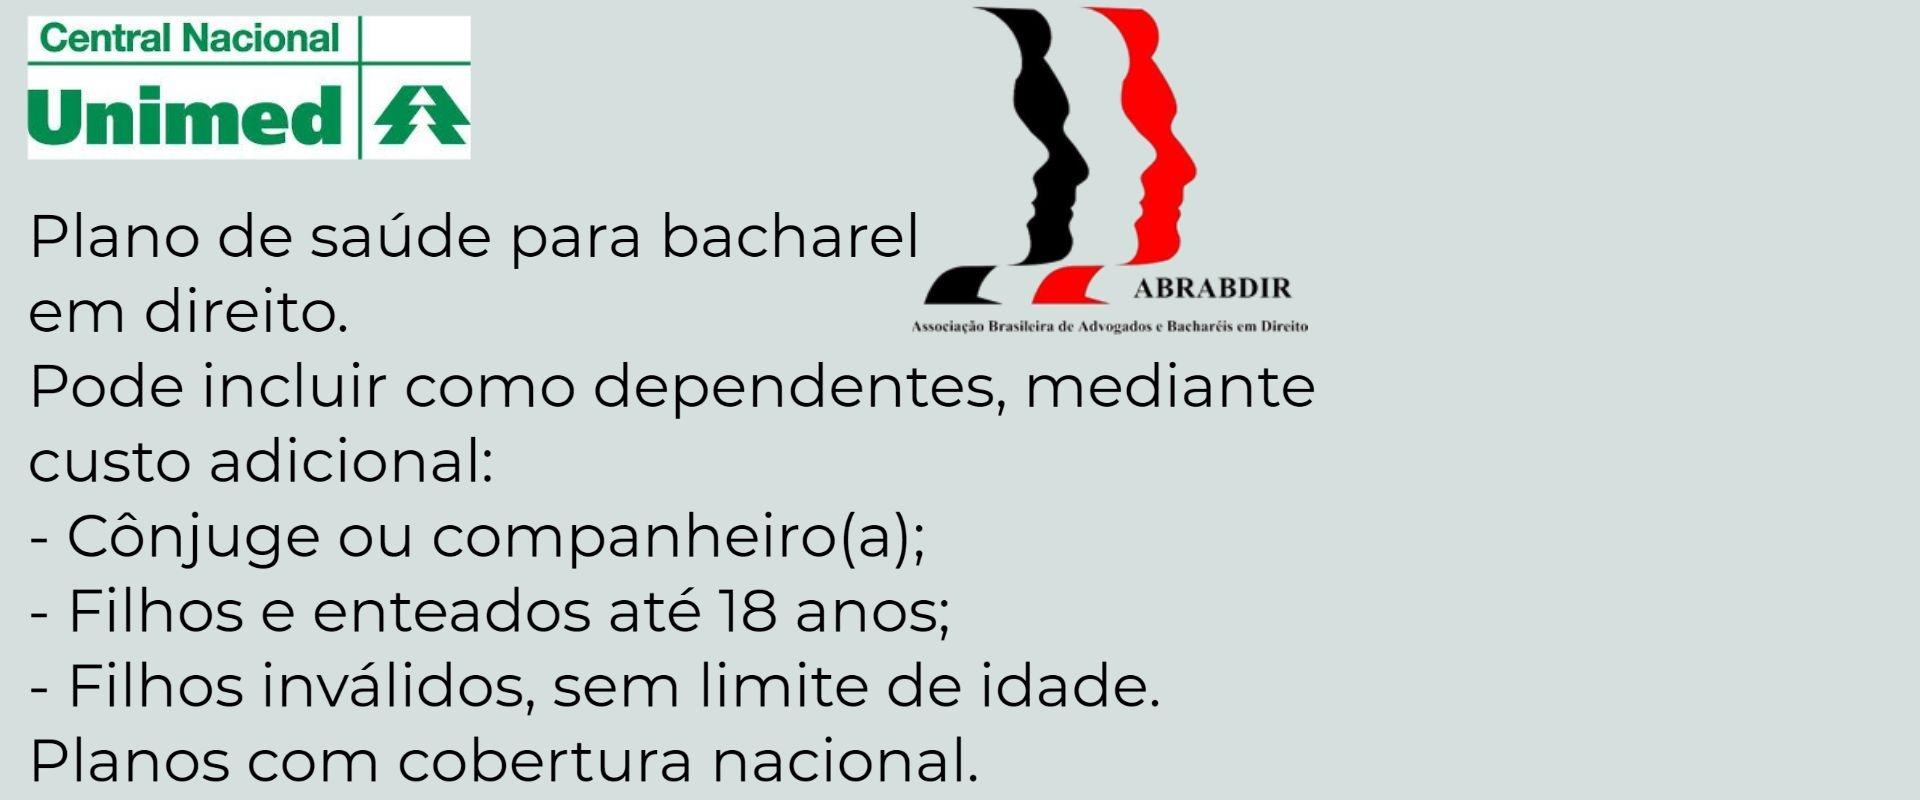 Unimed ABRABDIR Bauru